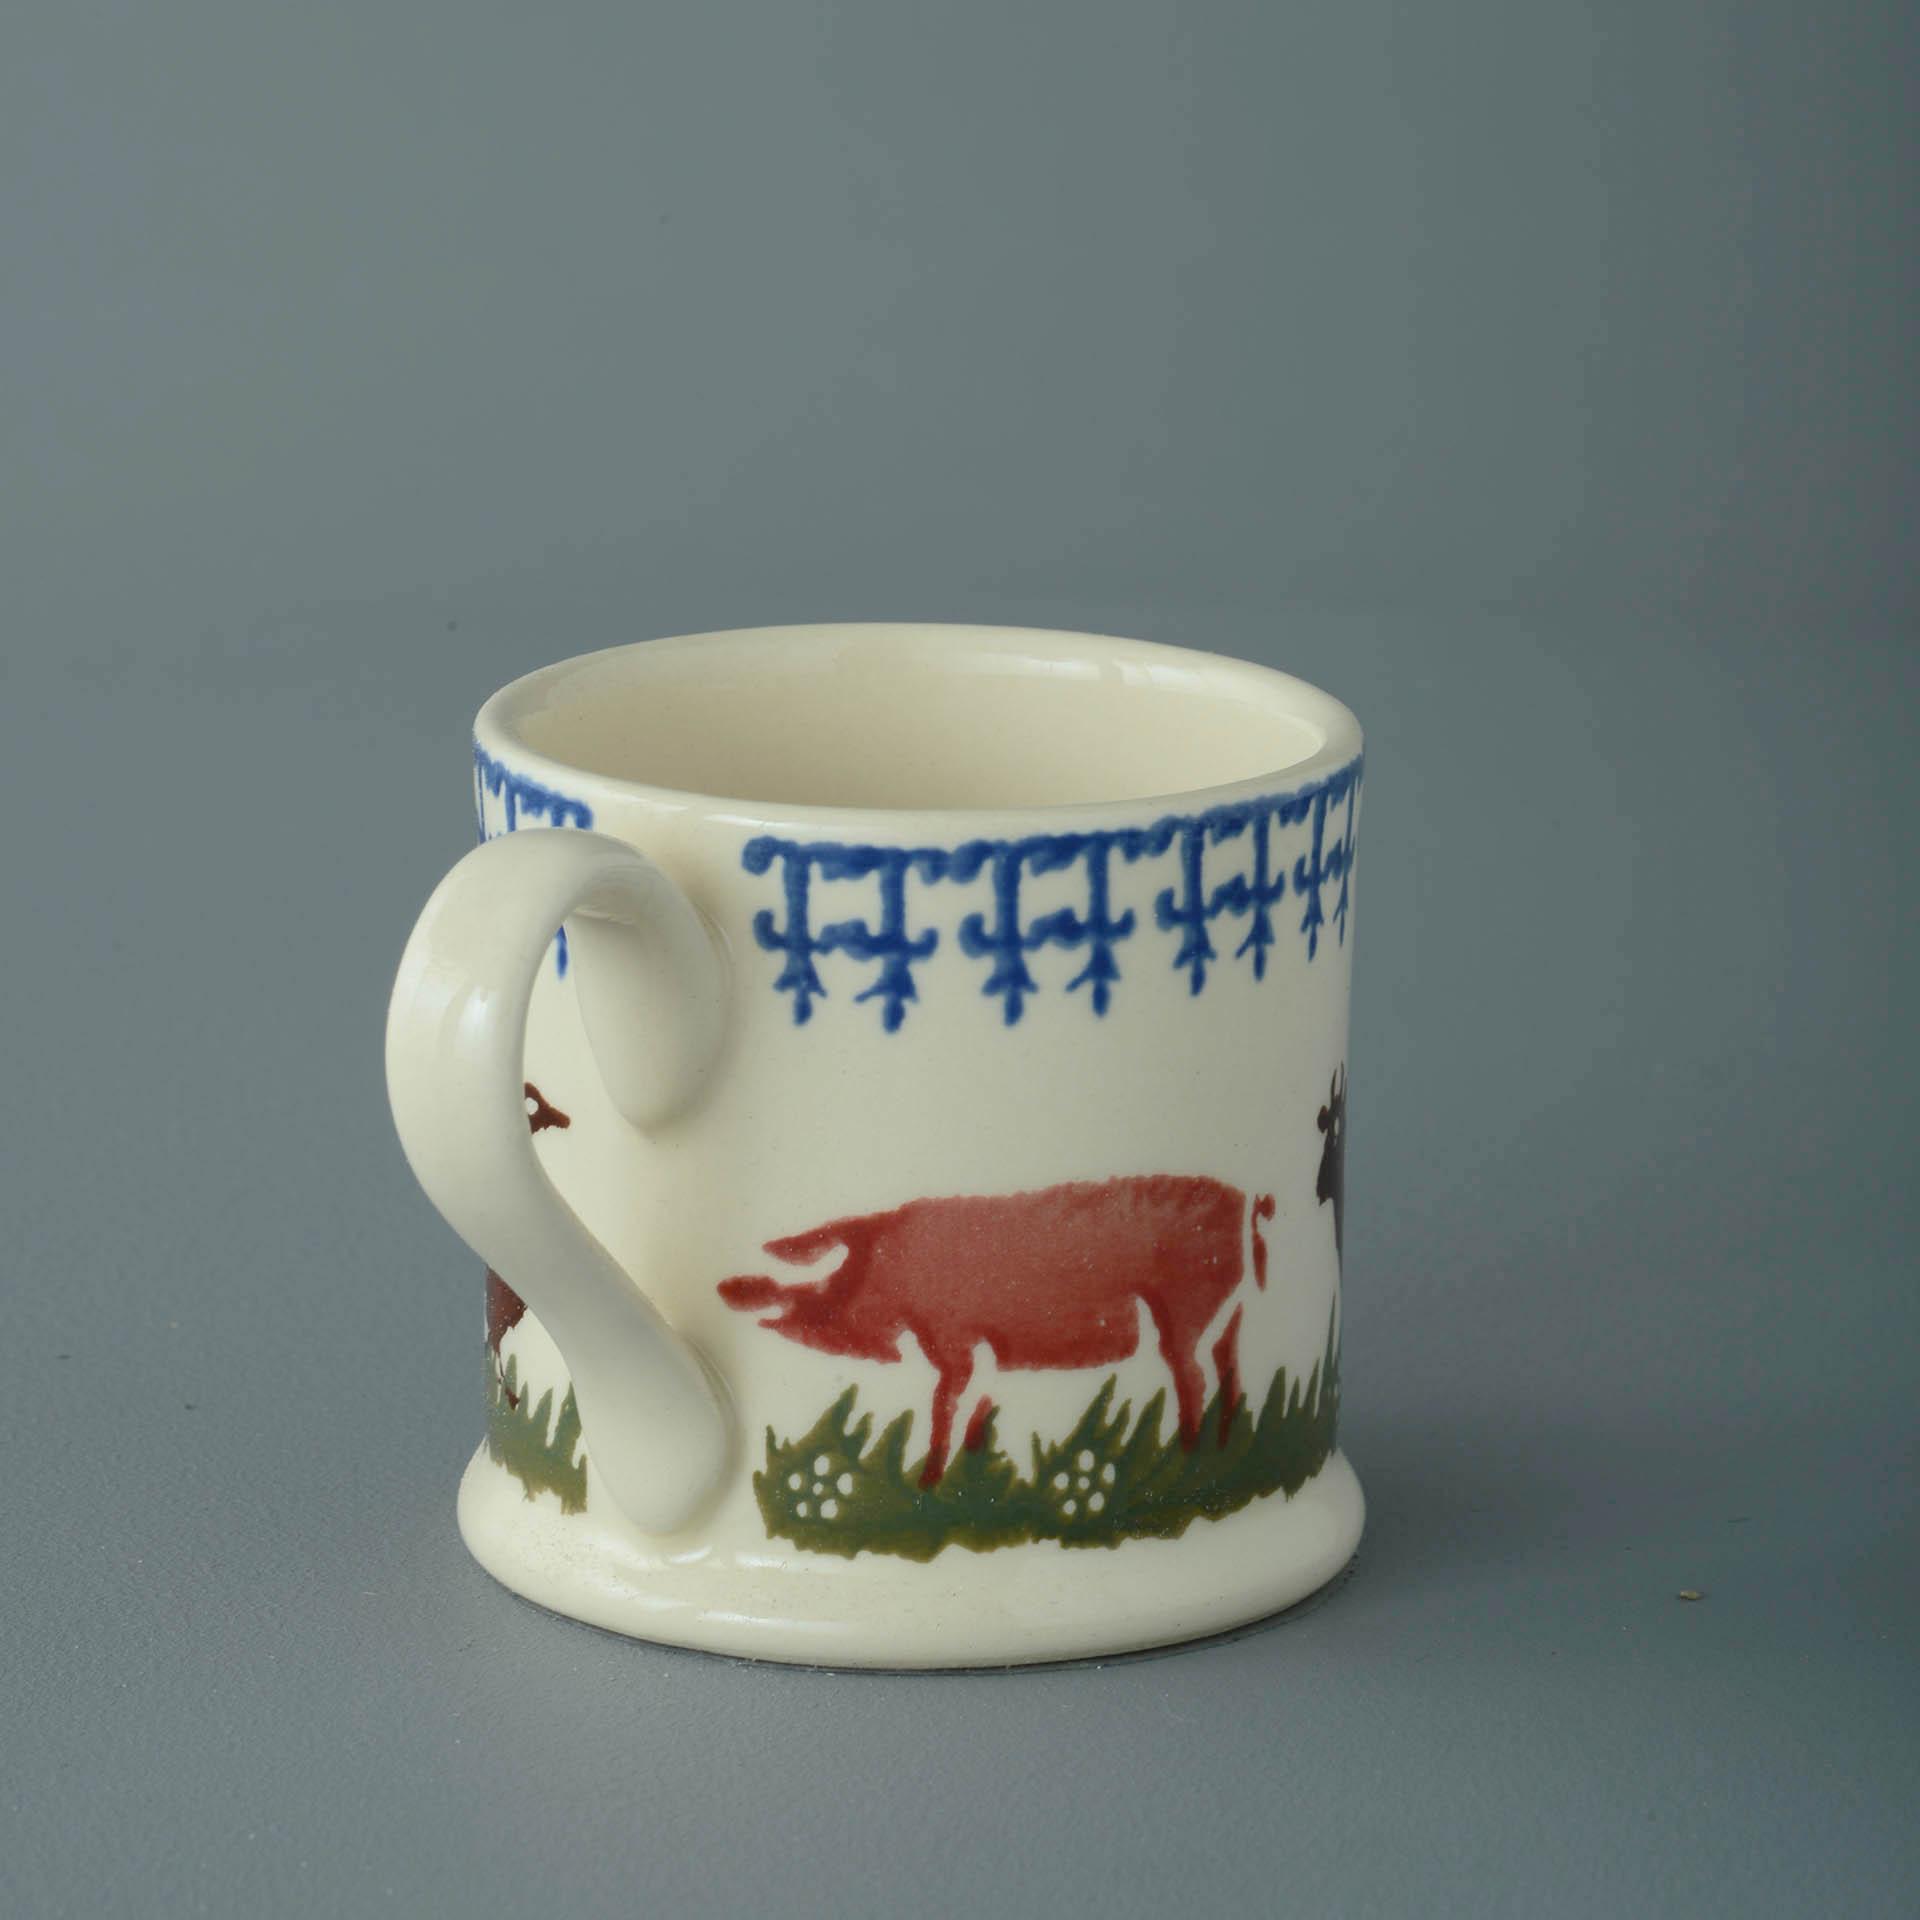 Farm Animals 150ml Small Mug 7 x 7.3cm